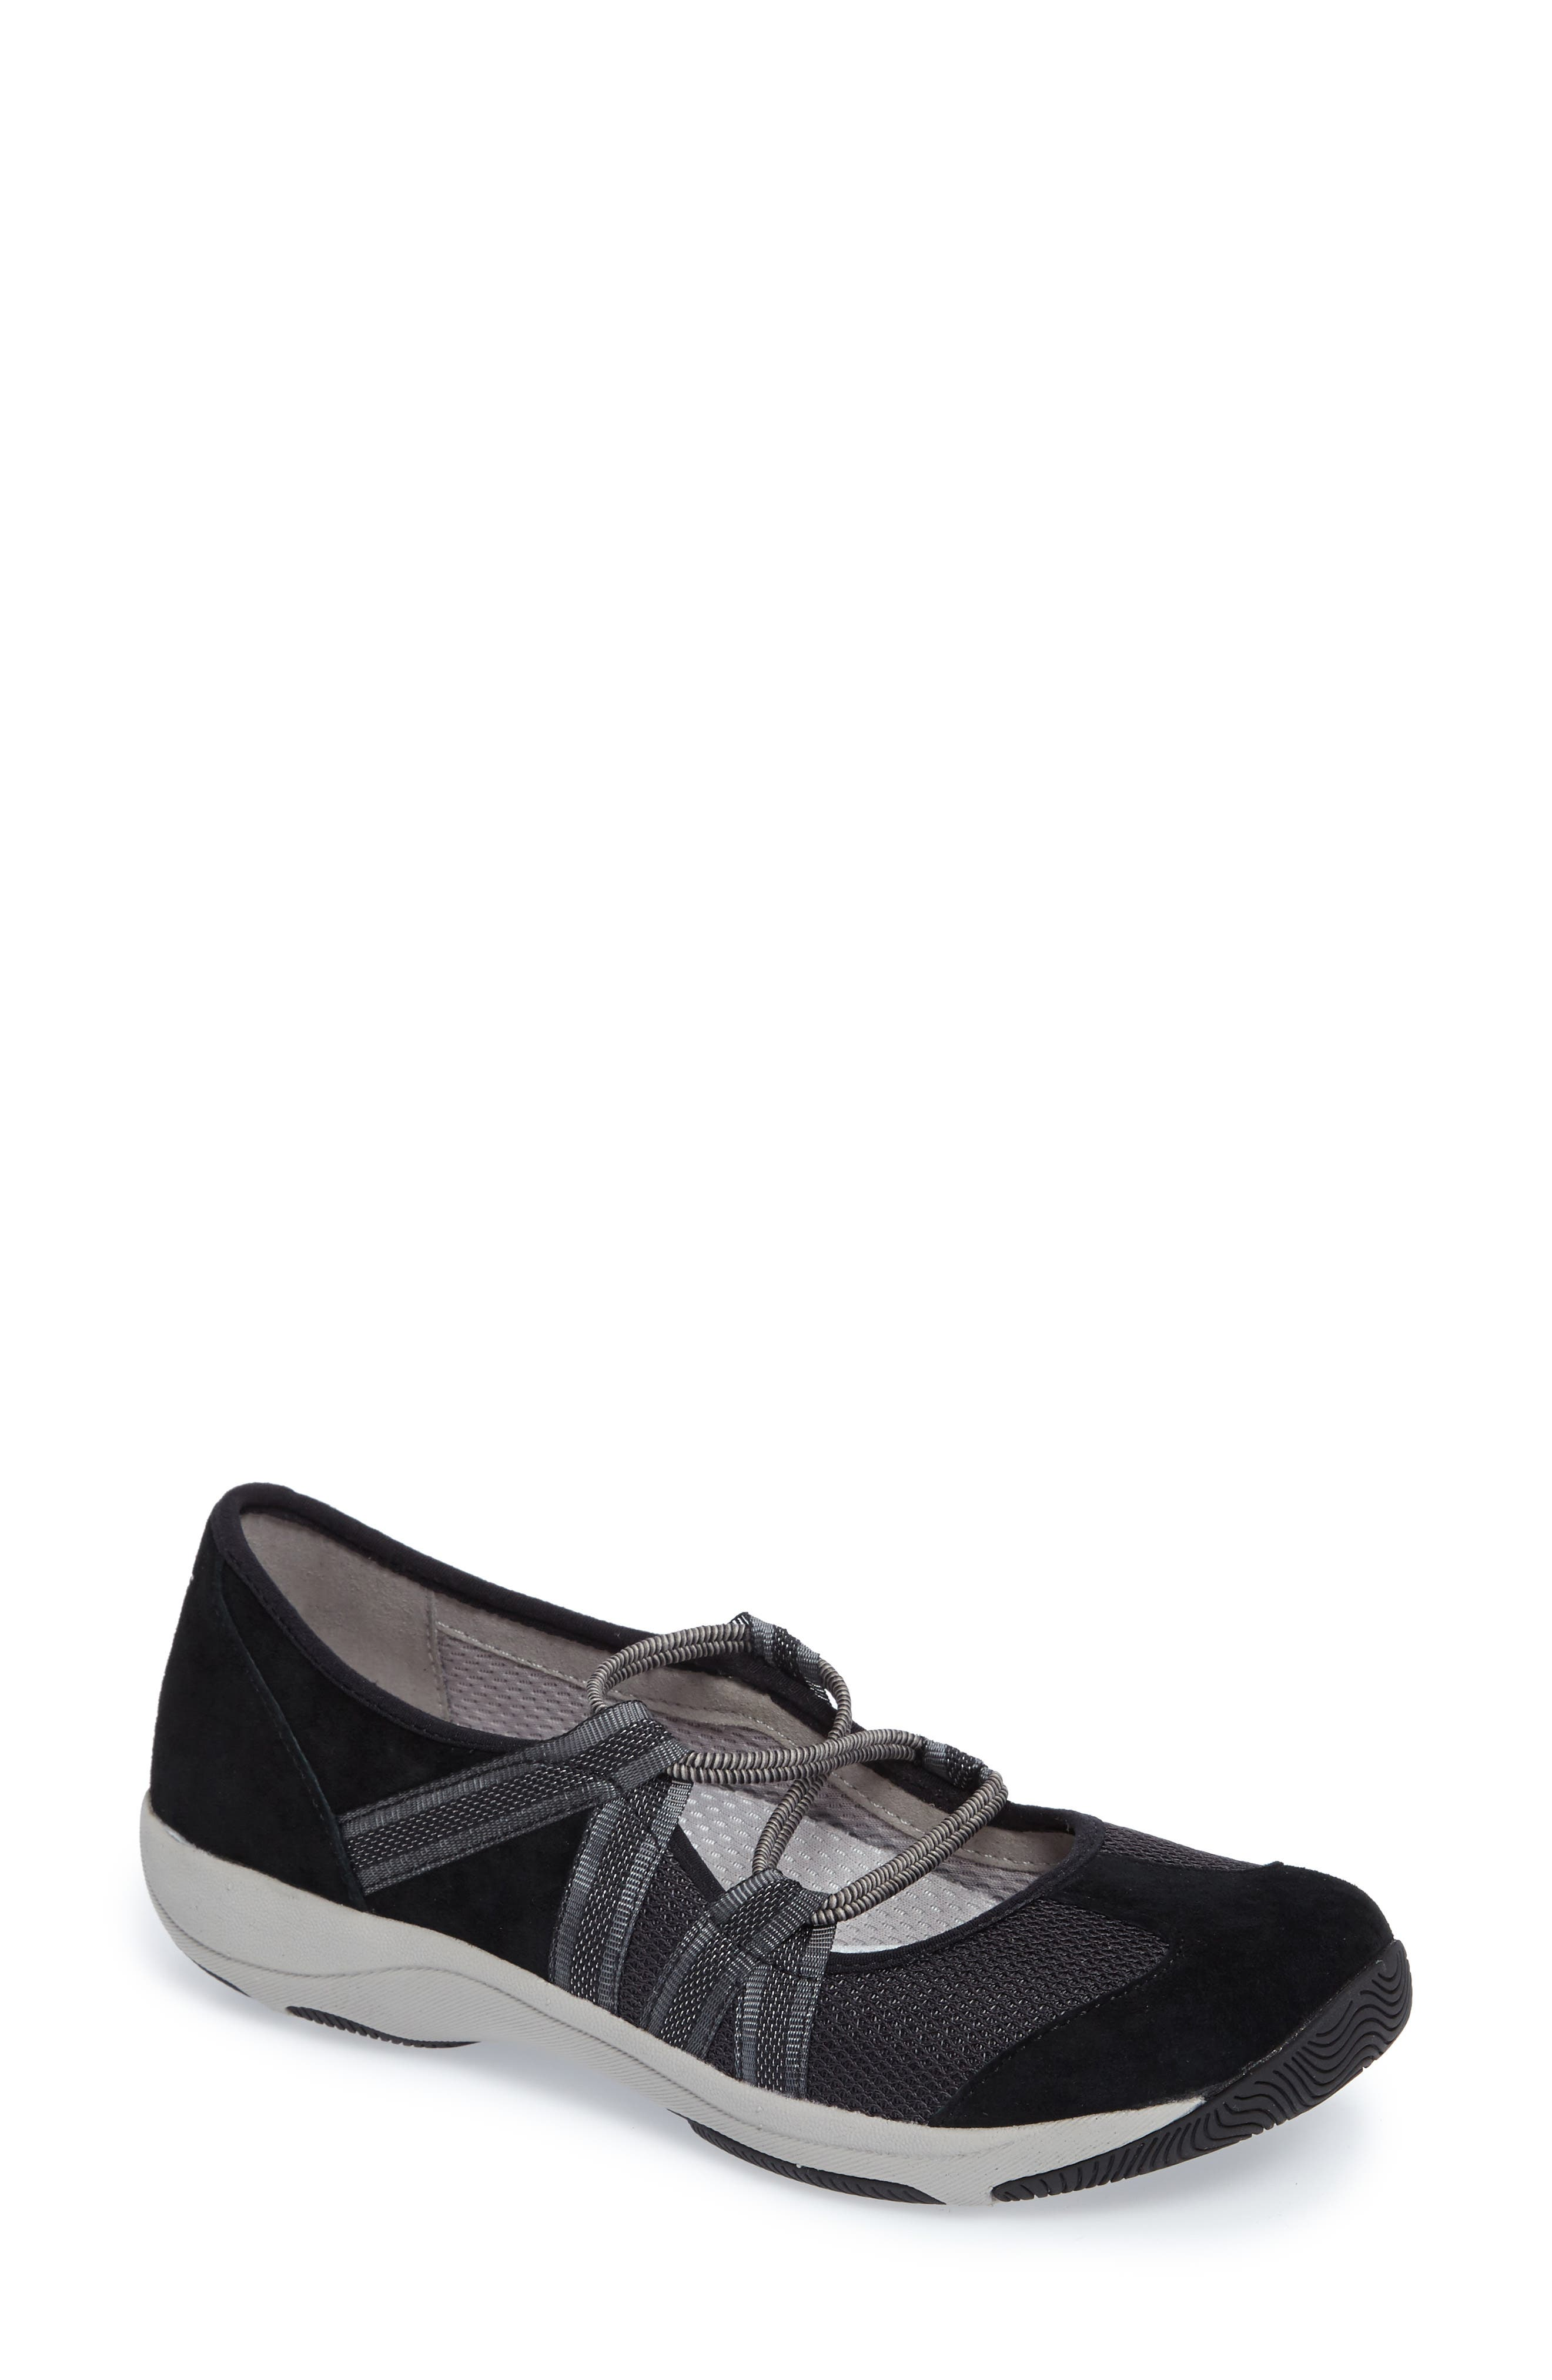 Honey Slip-On Sneaker,                             Main thumbnail 1, color,                             Black Suede